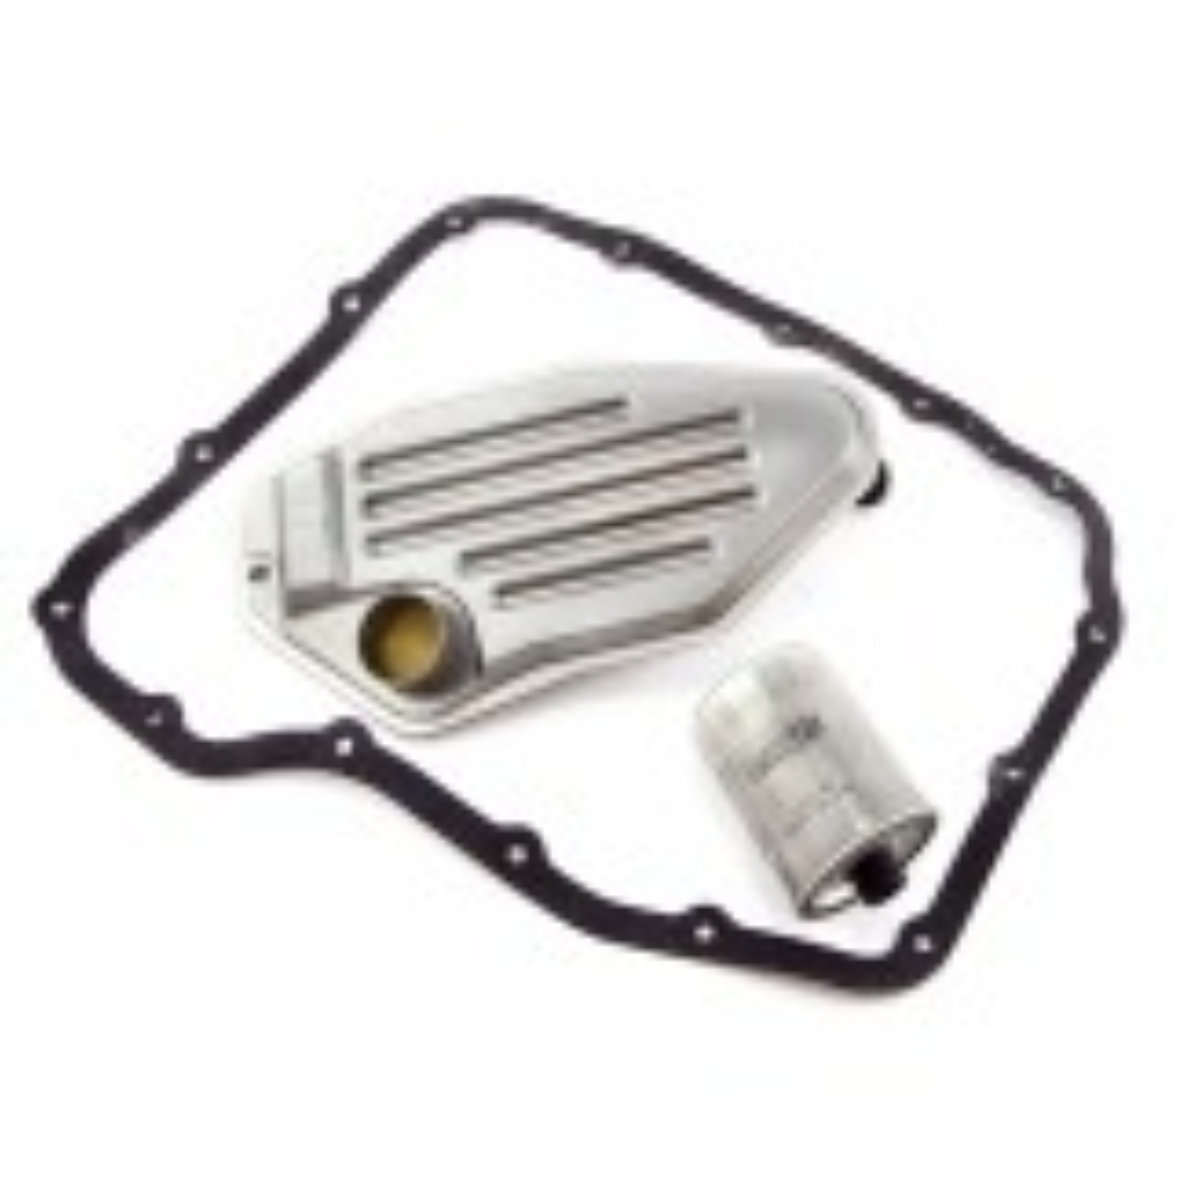 Filter Kit, Auto, 45RFE/545RFE; 99-13 WJ/WK/XK/KK/JK